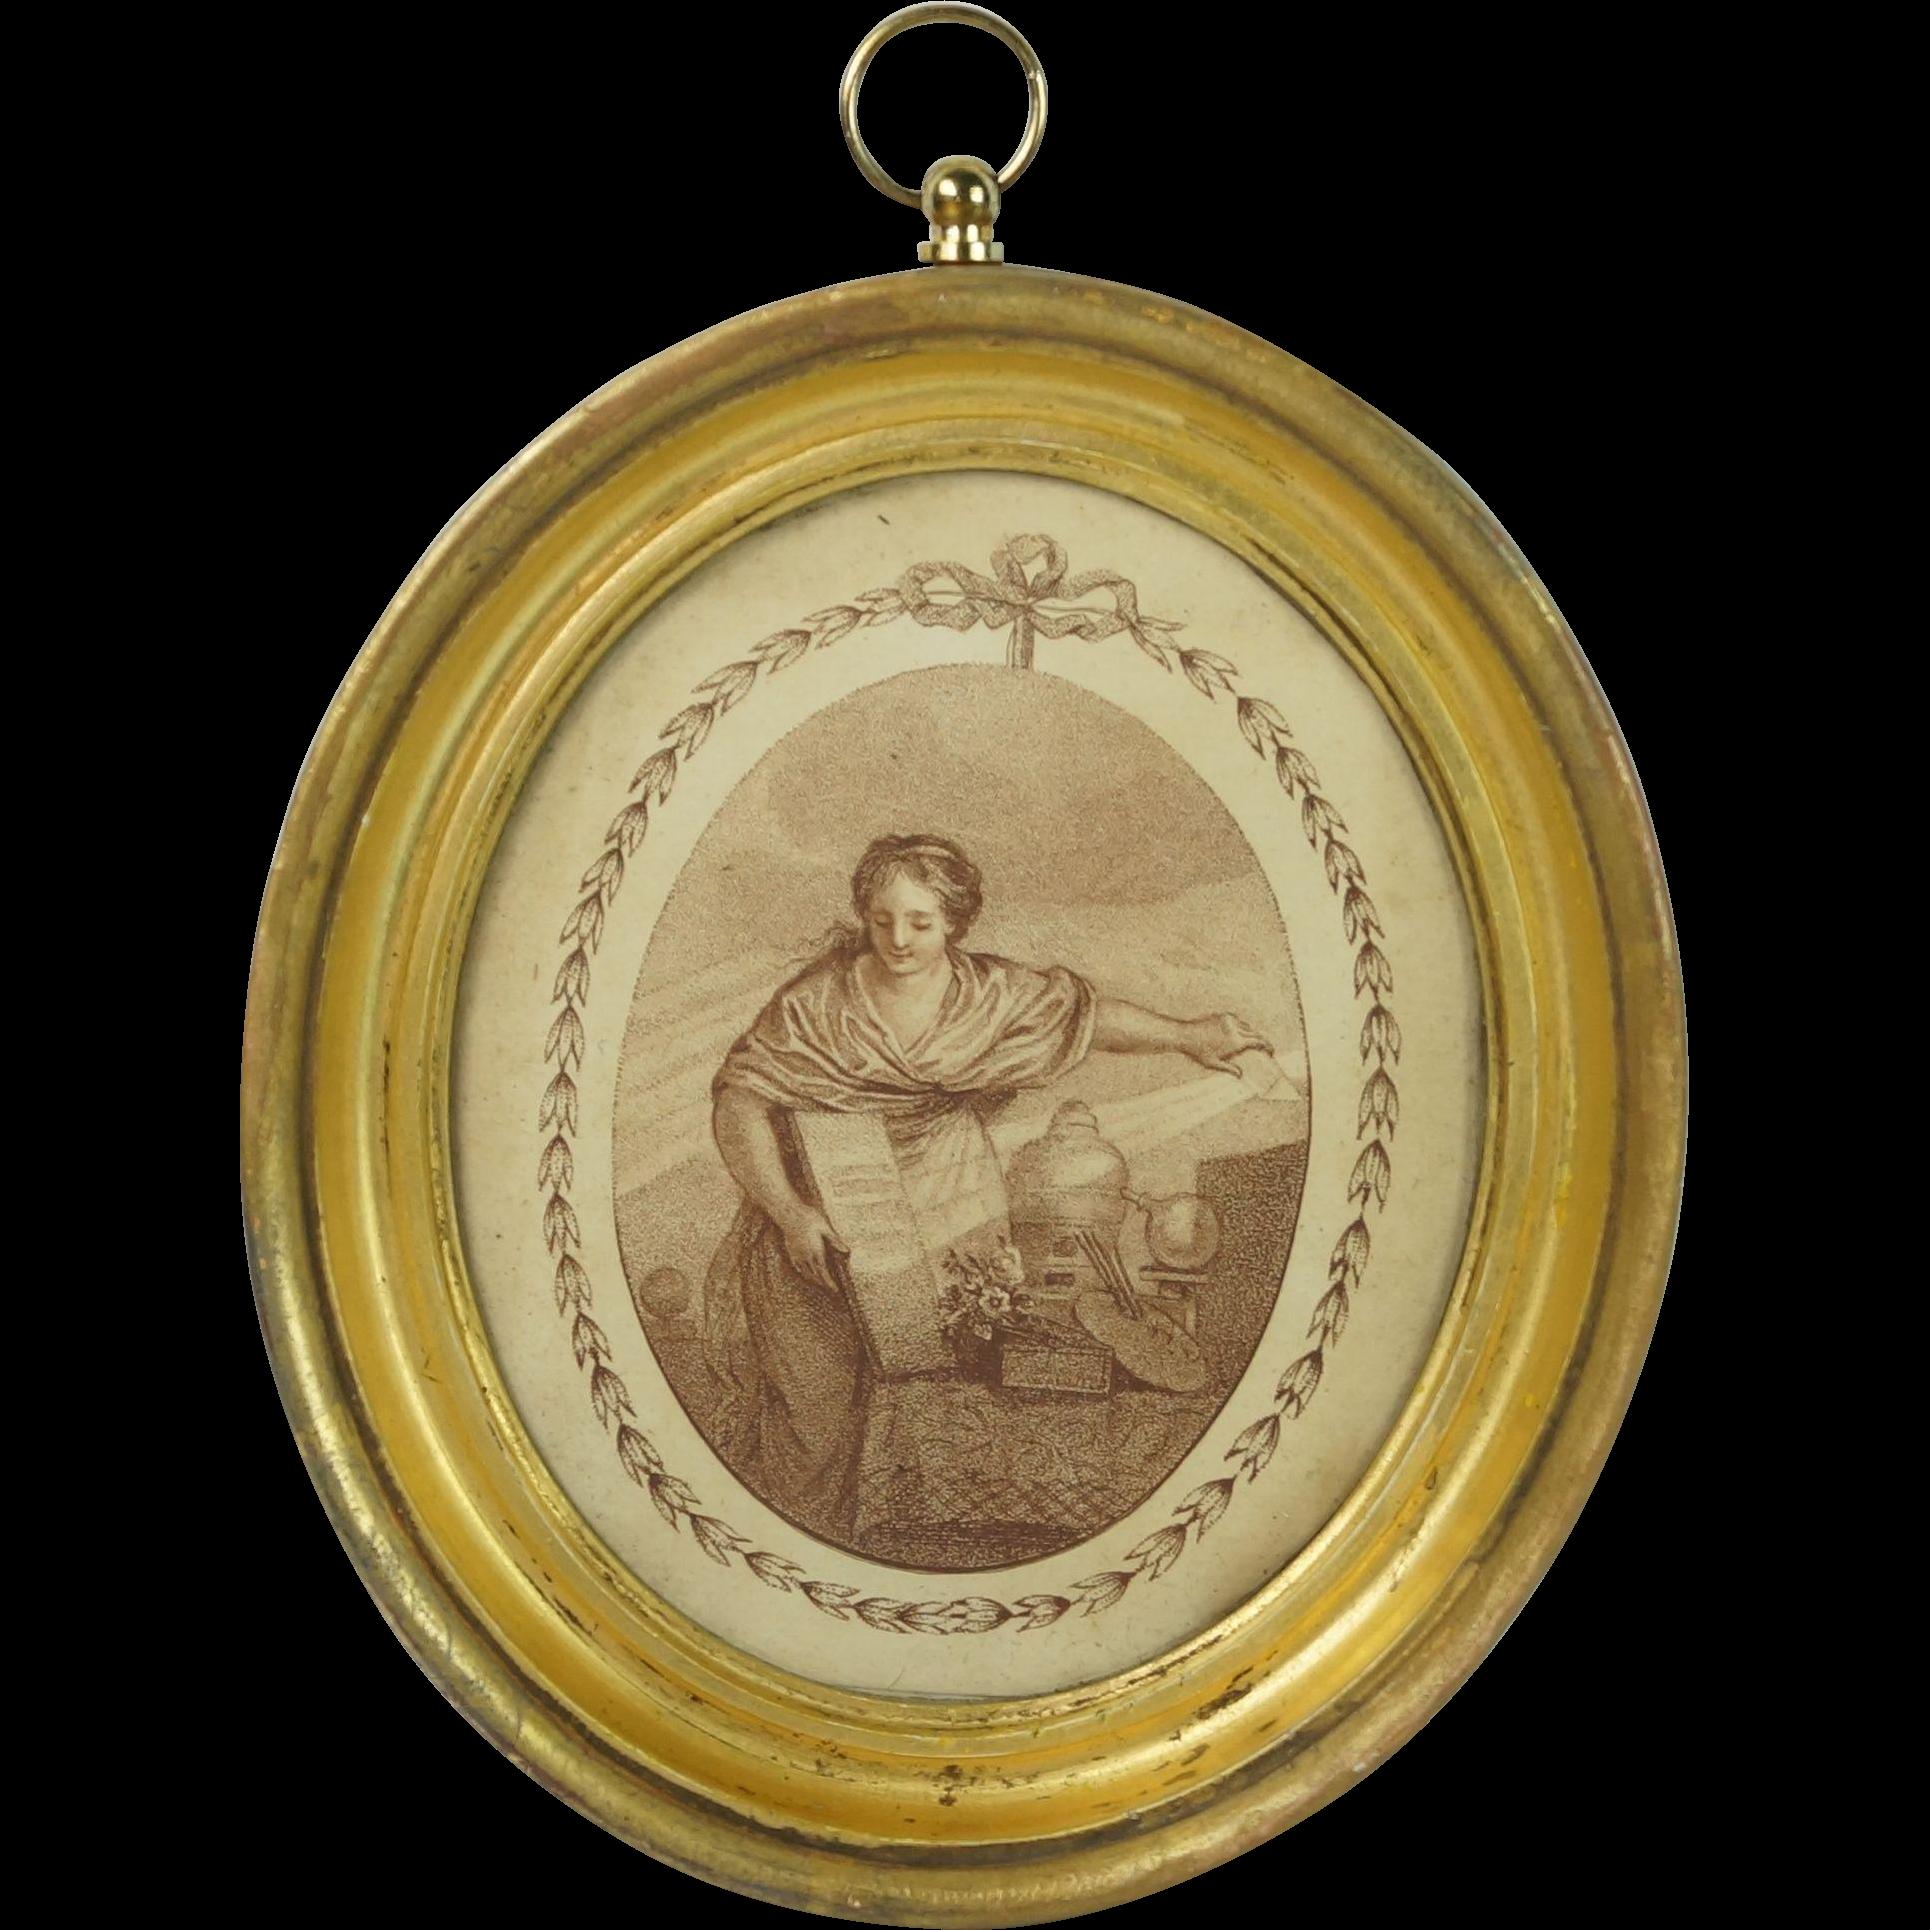 Antique 18th Century Miniature Stipple Engraving After Bartolozzi Lemon Gilt Frame Circa 1790s